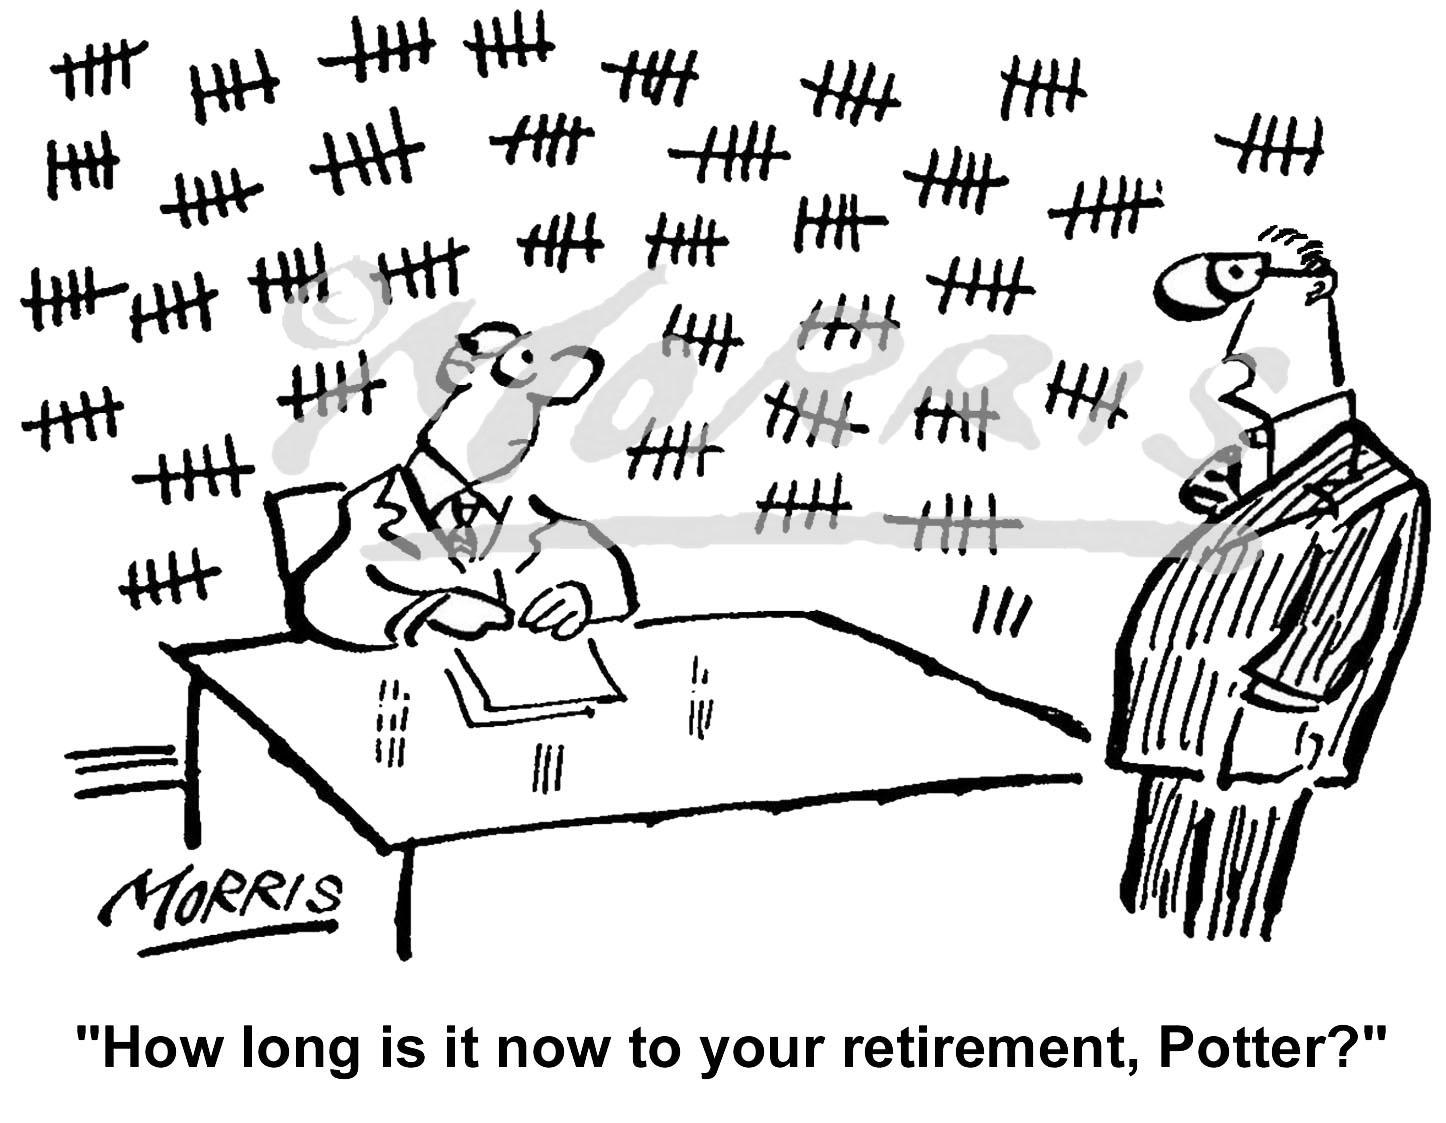 Office worker retirement cartoon Ref: 0790bw